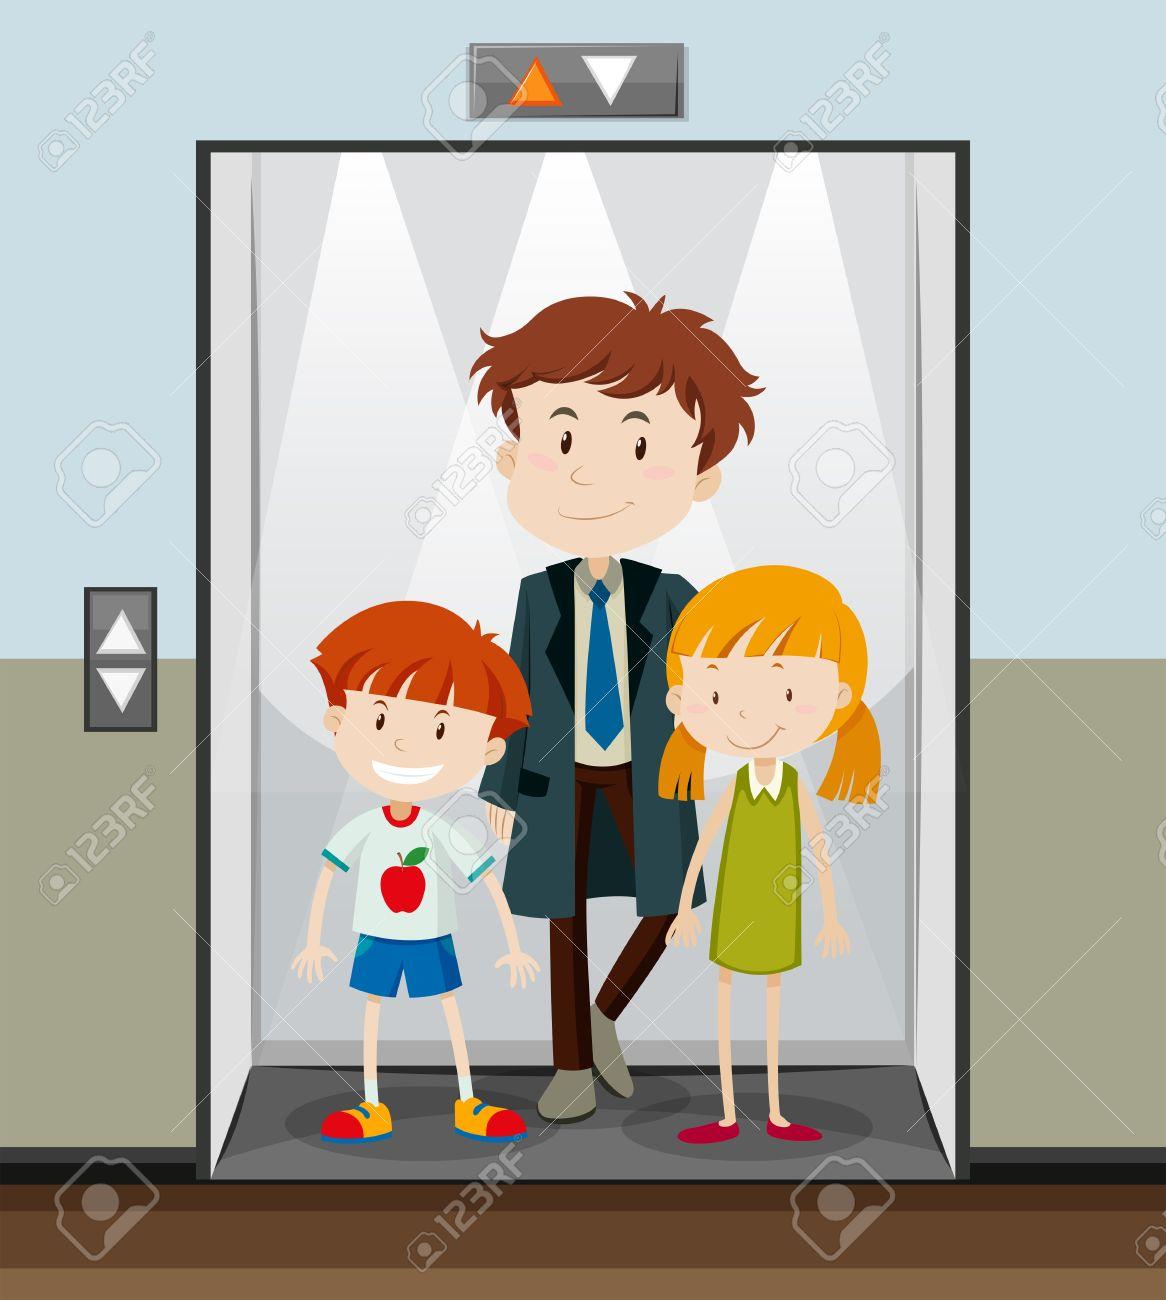 People using elevator going up illustration.